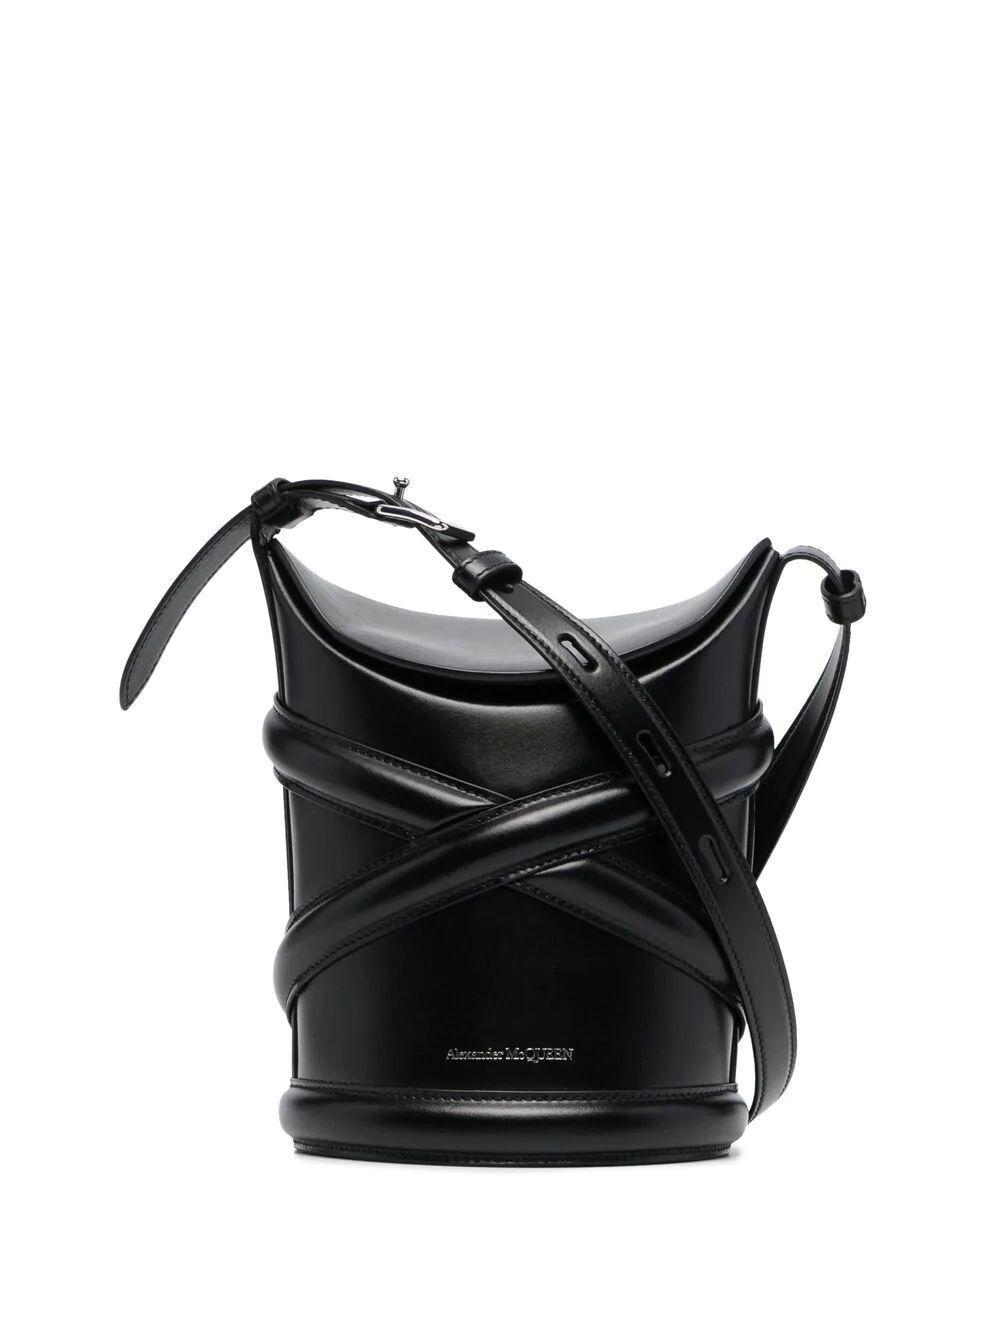 The Curve Bucket Bag Item # 6564671YB40